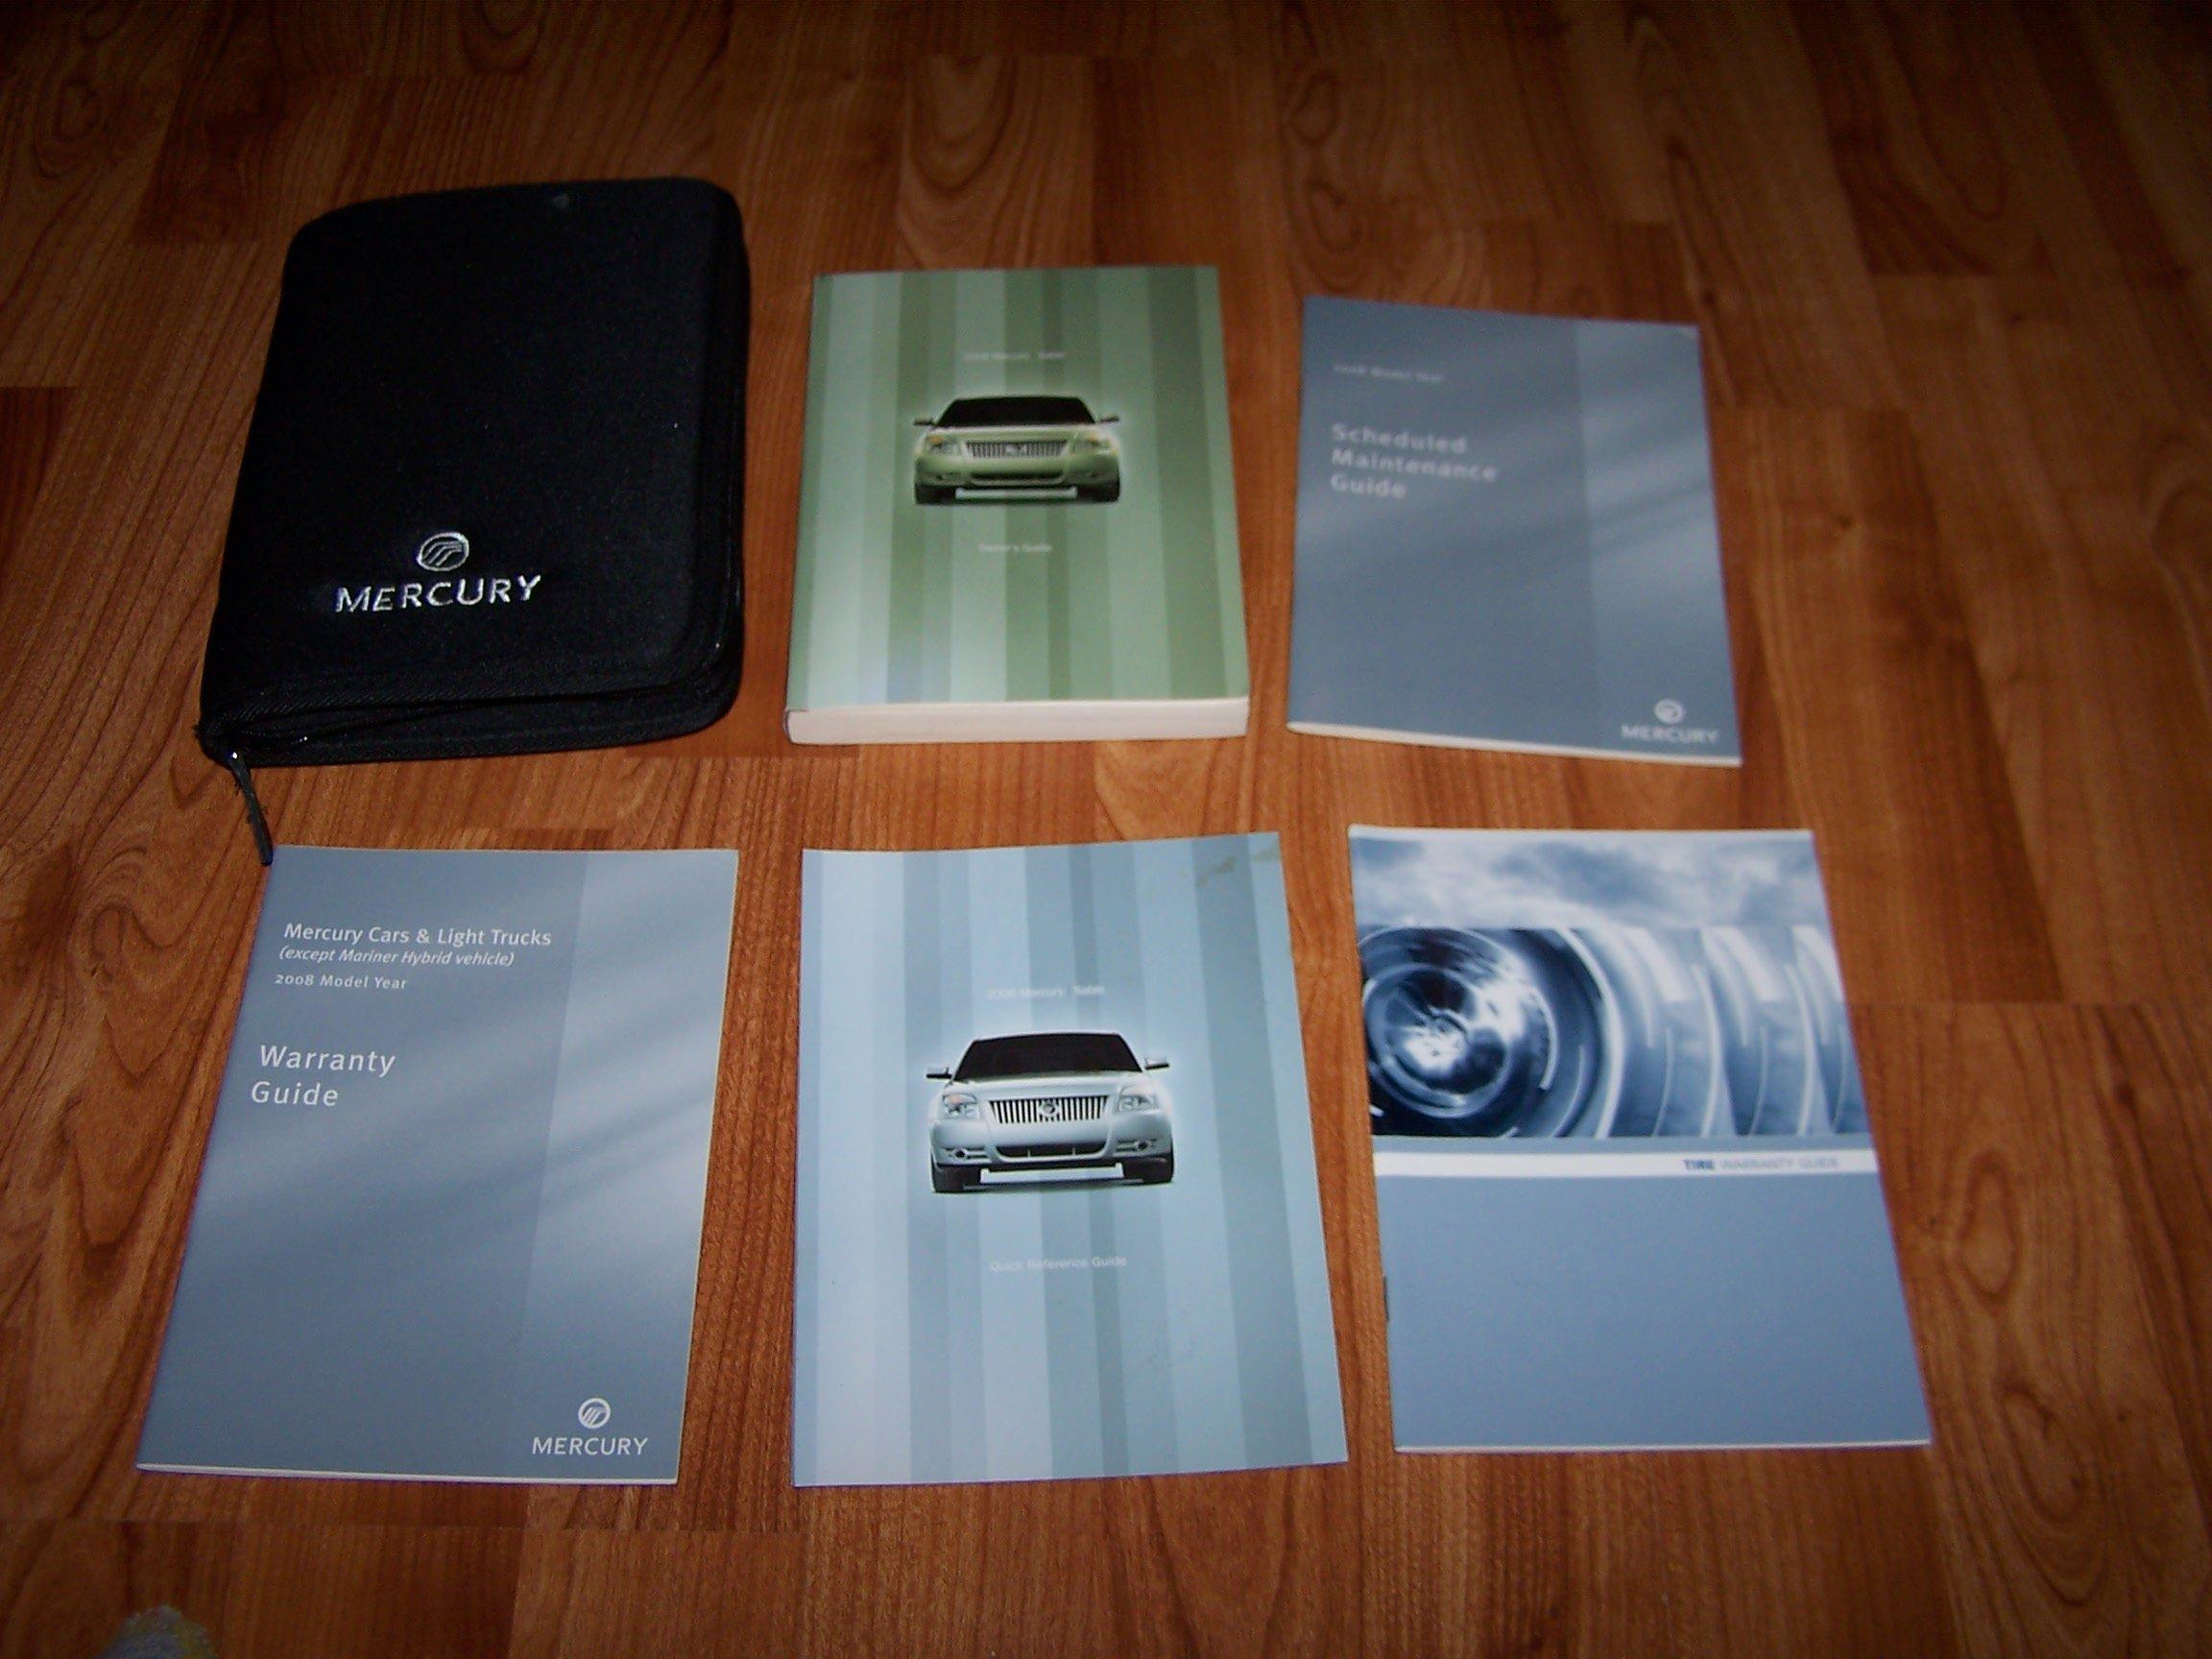 2008 mercury sable owners manual ford lincoln mercury automotive rh amazon com 2005 Mercury Sable 2008 mercury sable service manual